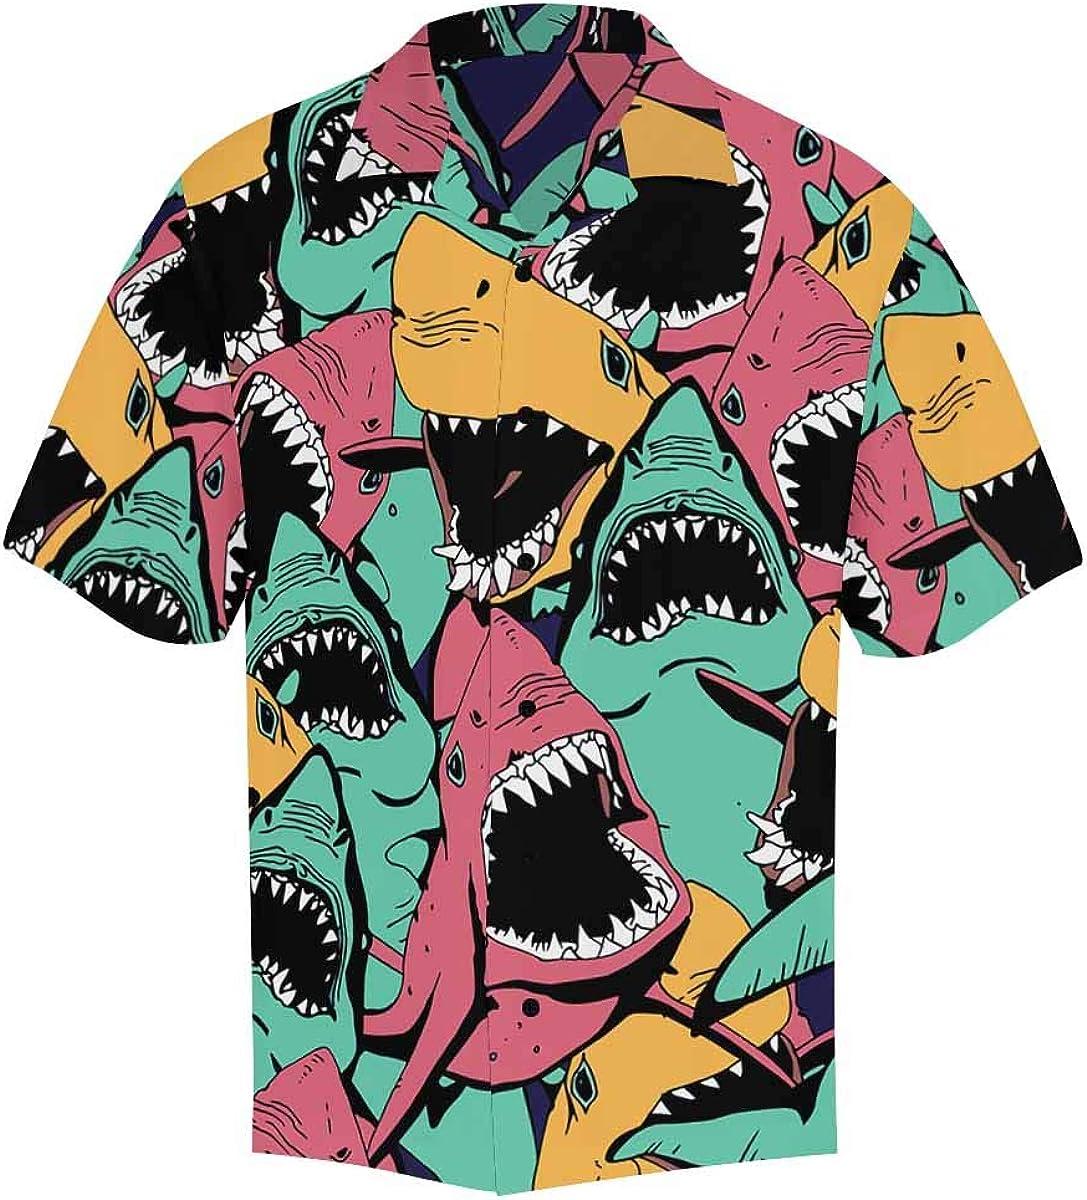 InterestPrint Men's Casual Button Down Short Sleeve Colorful Angry Shark Hawaiian Shirt (S-5XL)